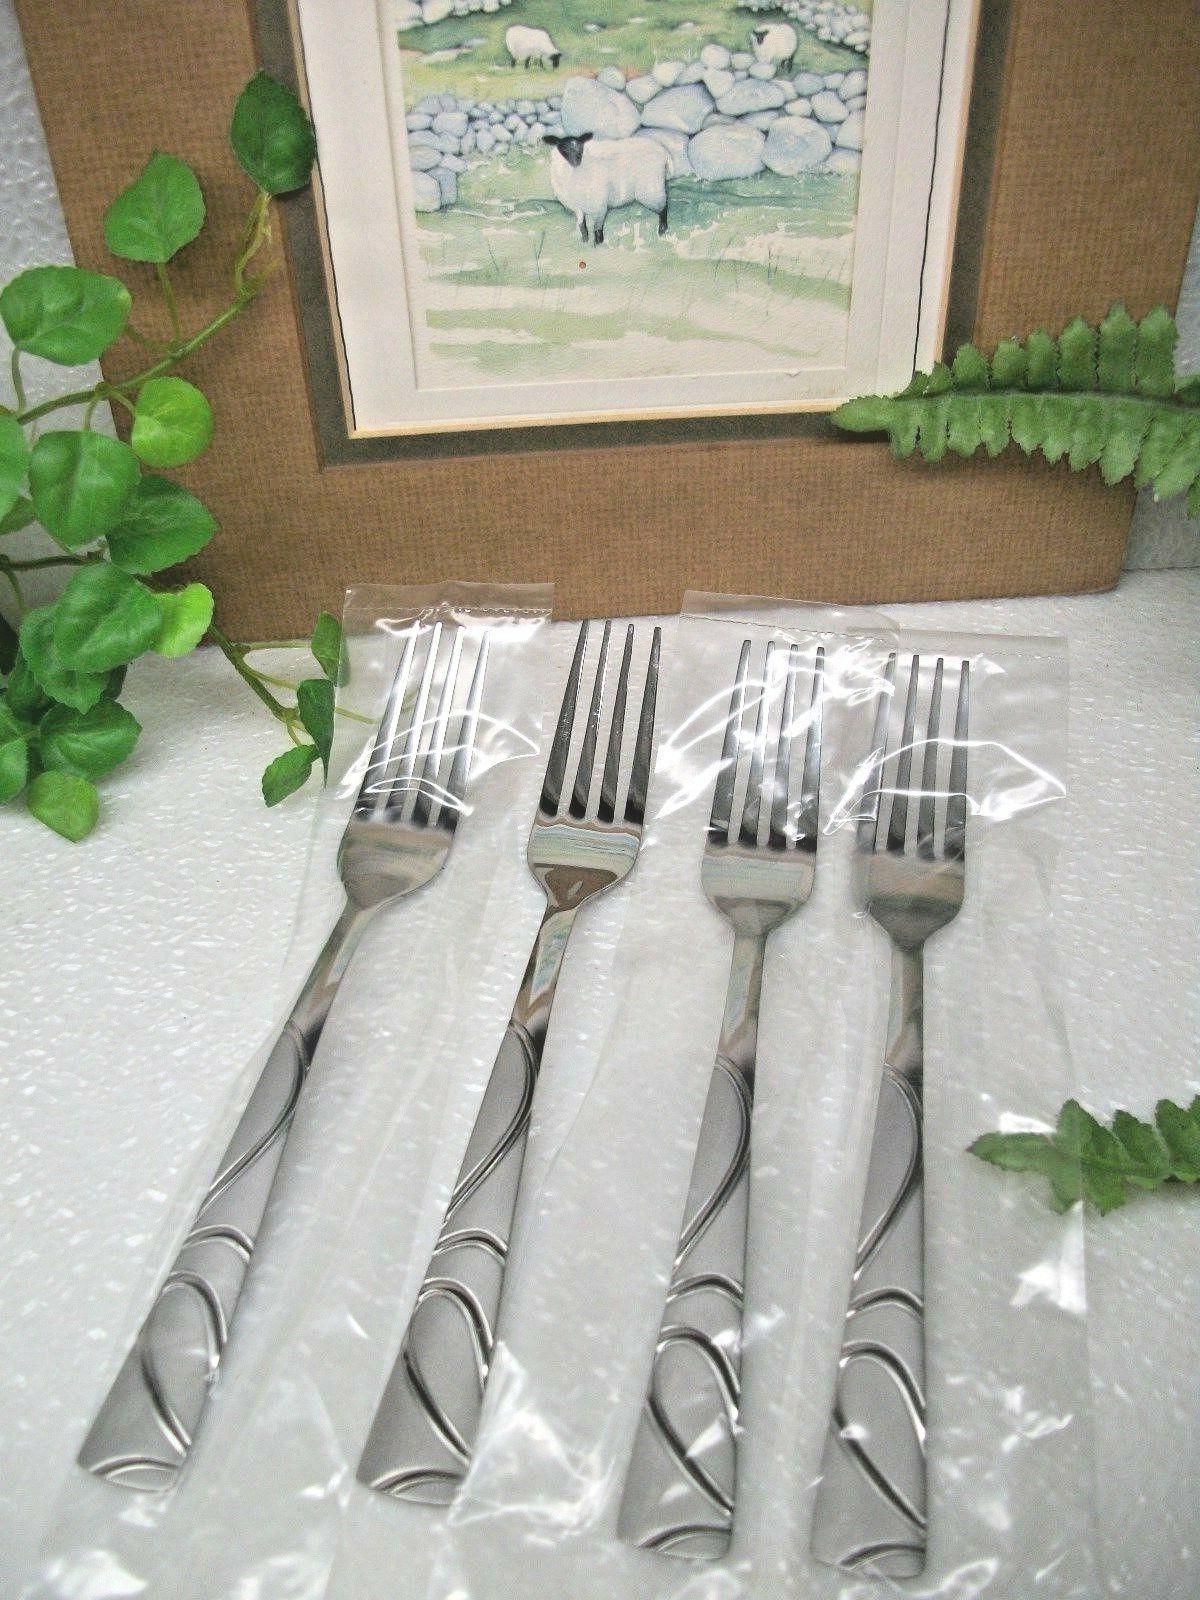 4 sasha sand stainless steel dinner forks